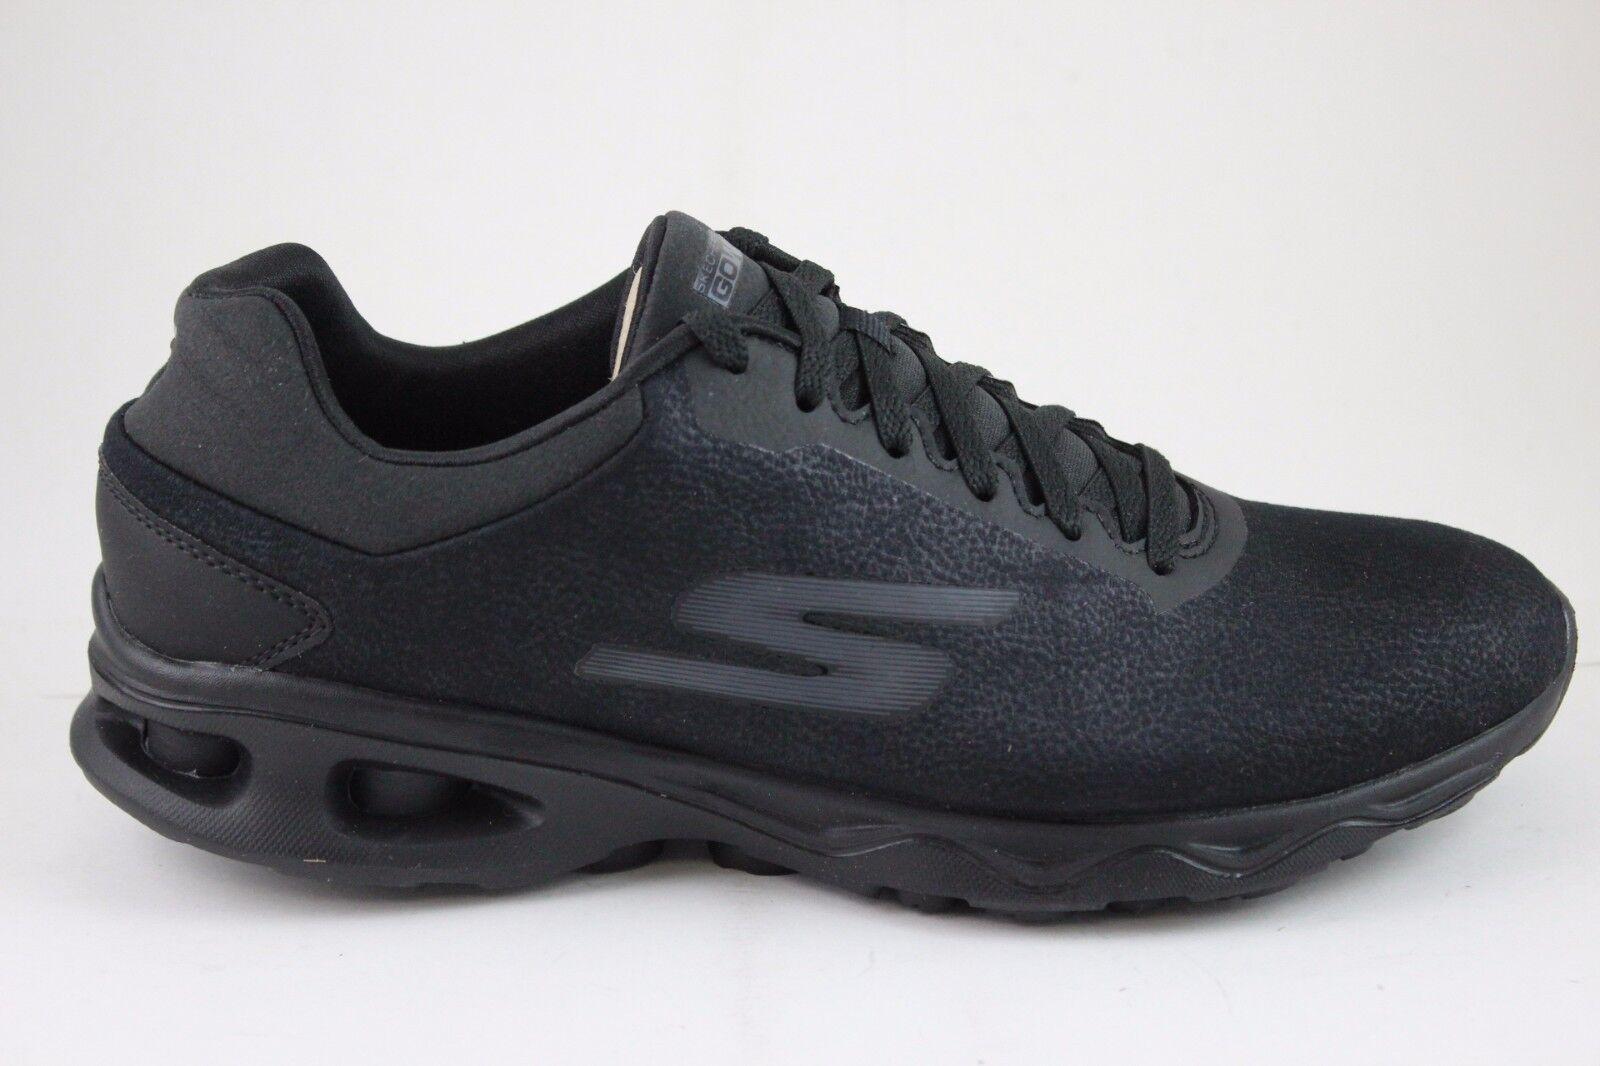 Skechers Performance Women's Go Zip-14838 Walking Shoe, Black, 6.5 M US